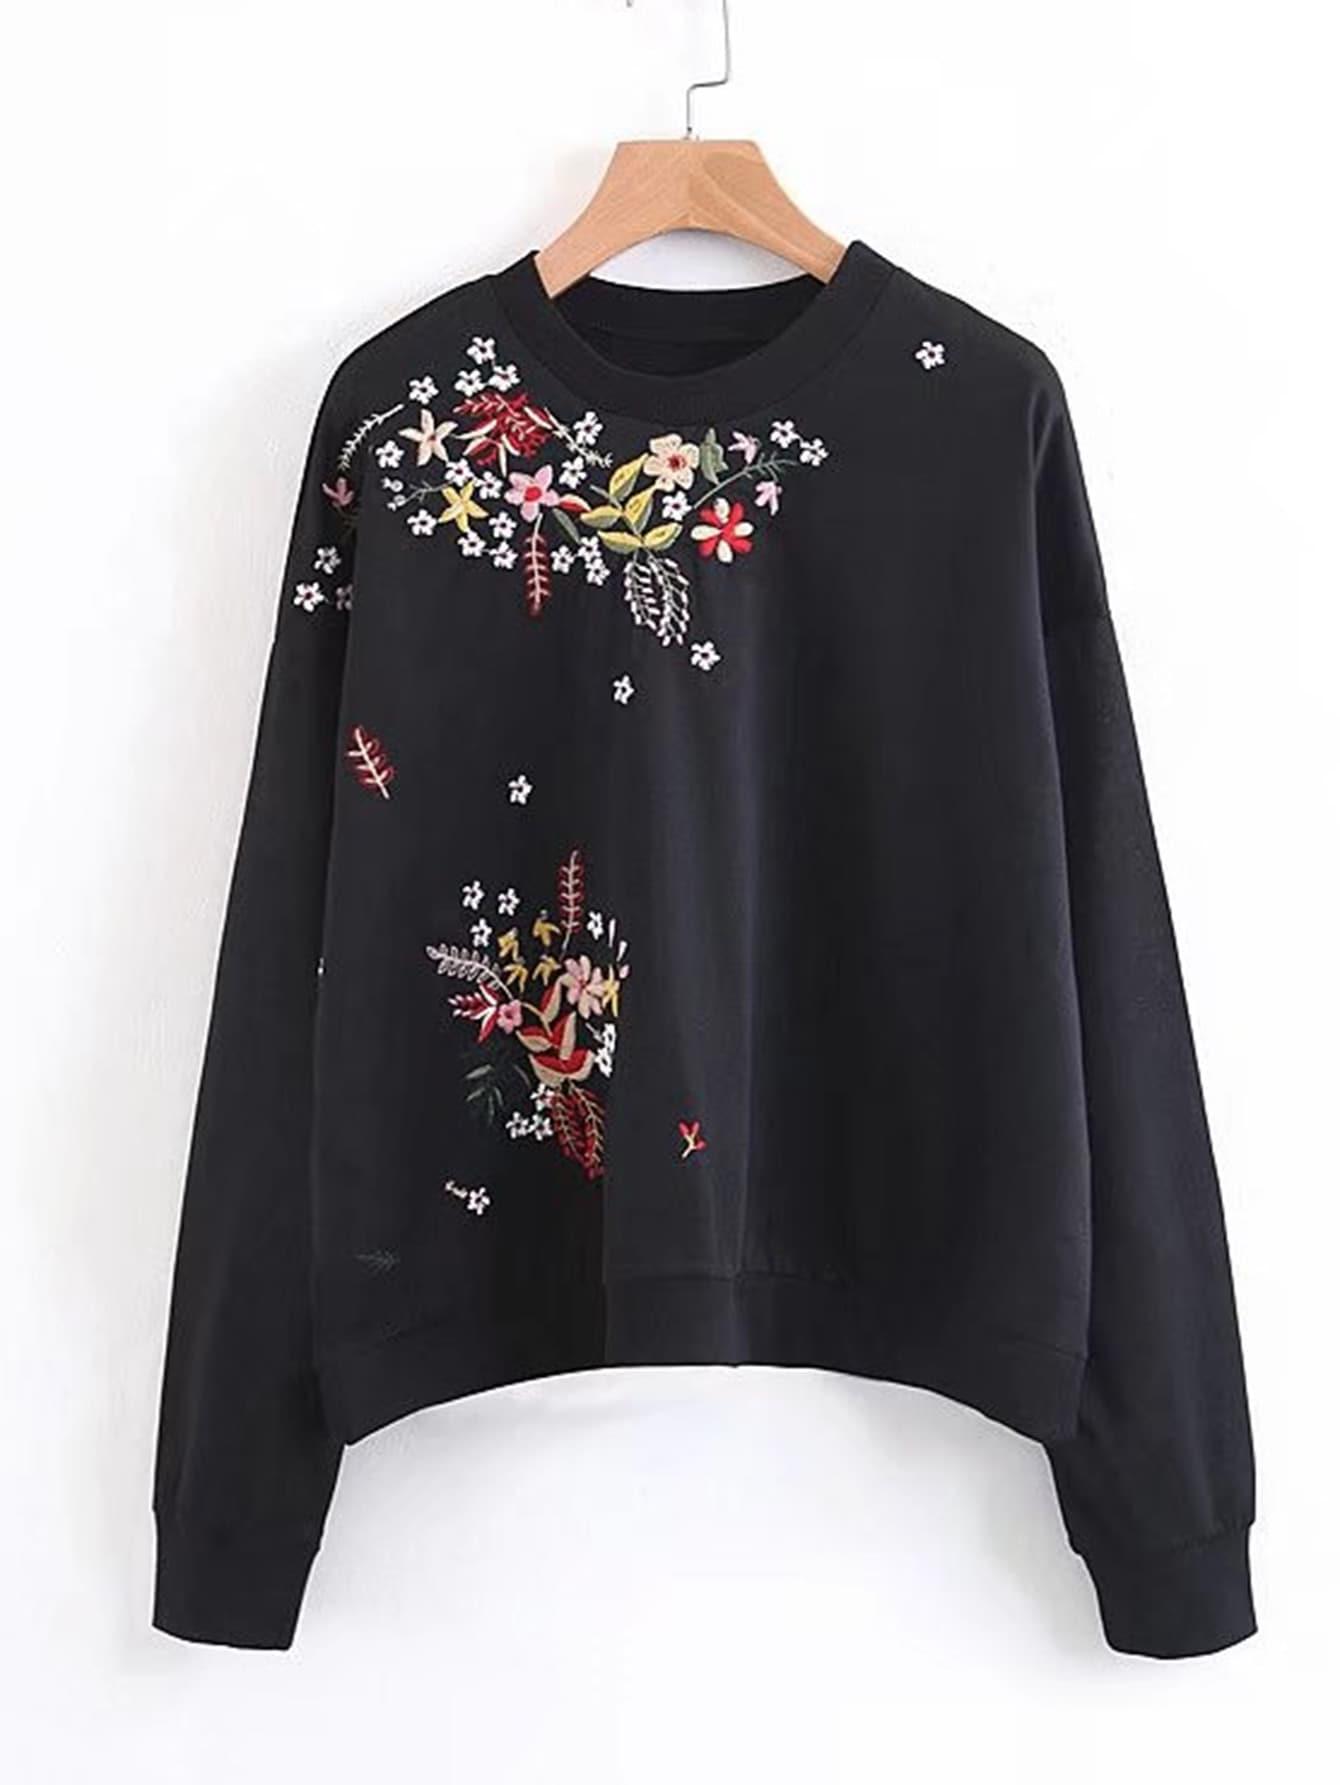 Flower Embroidery Boyfriend Sweatshirt 23150 1 907375